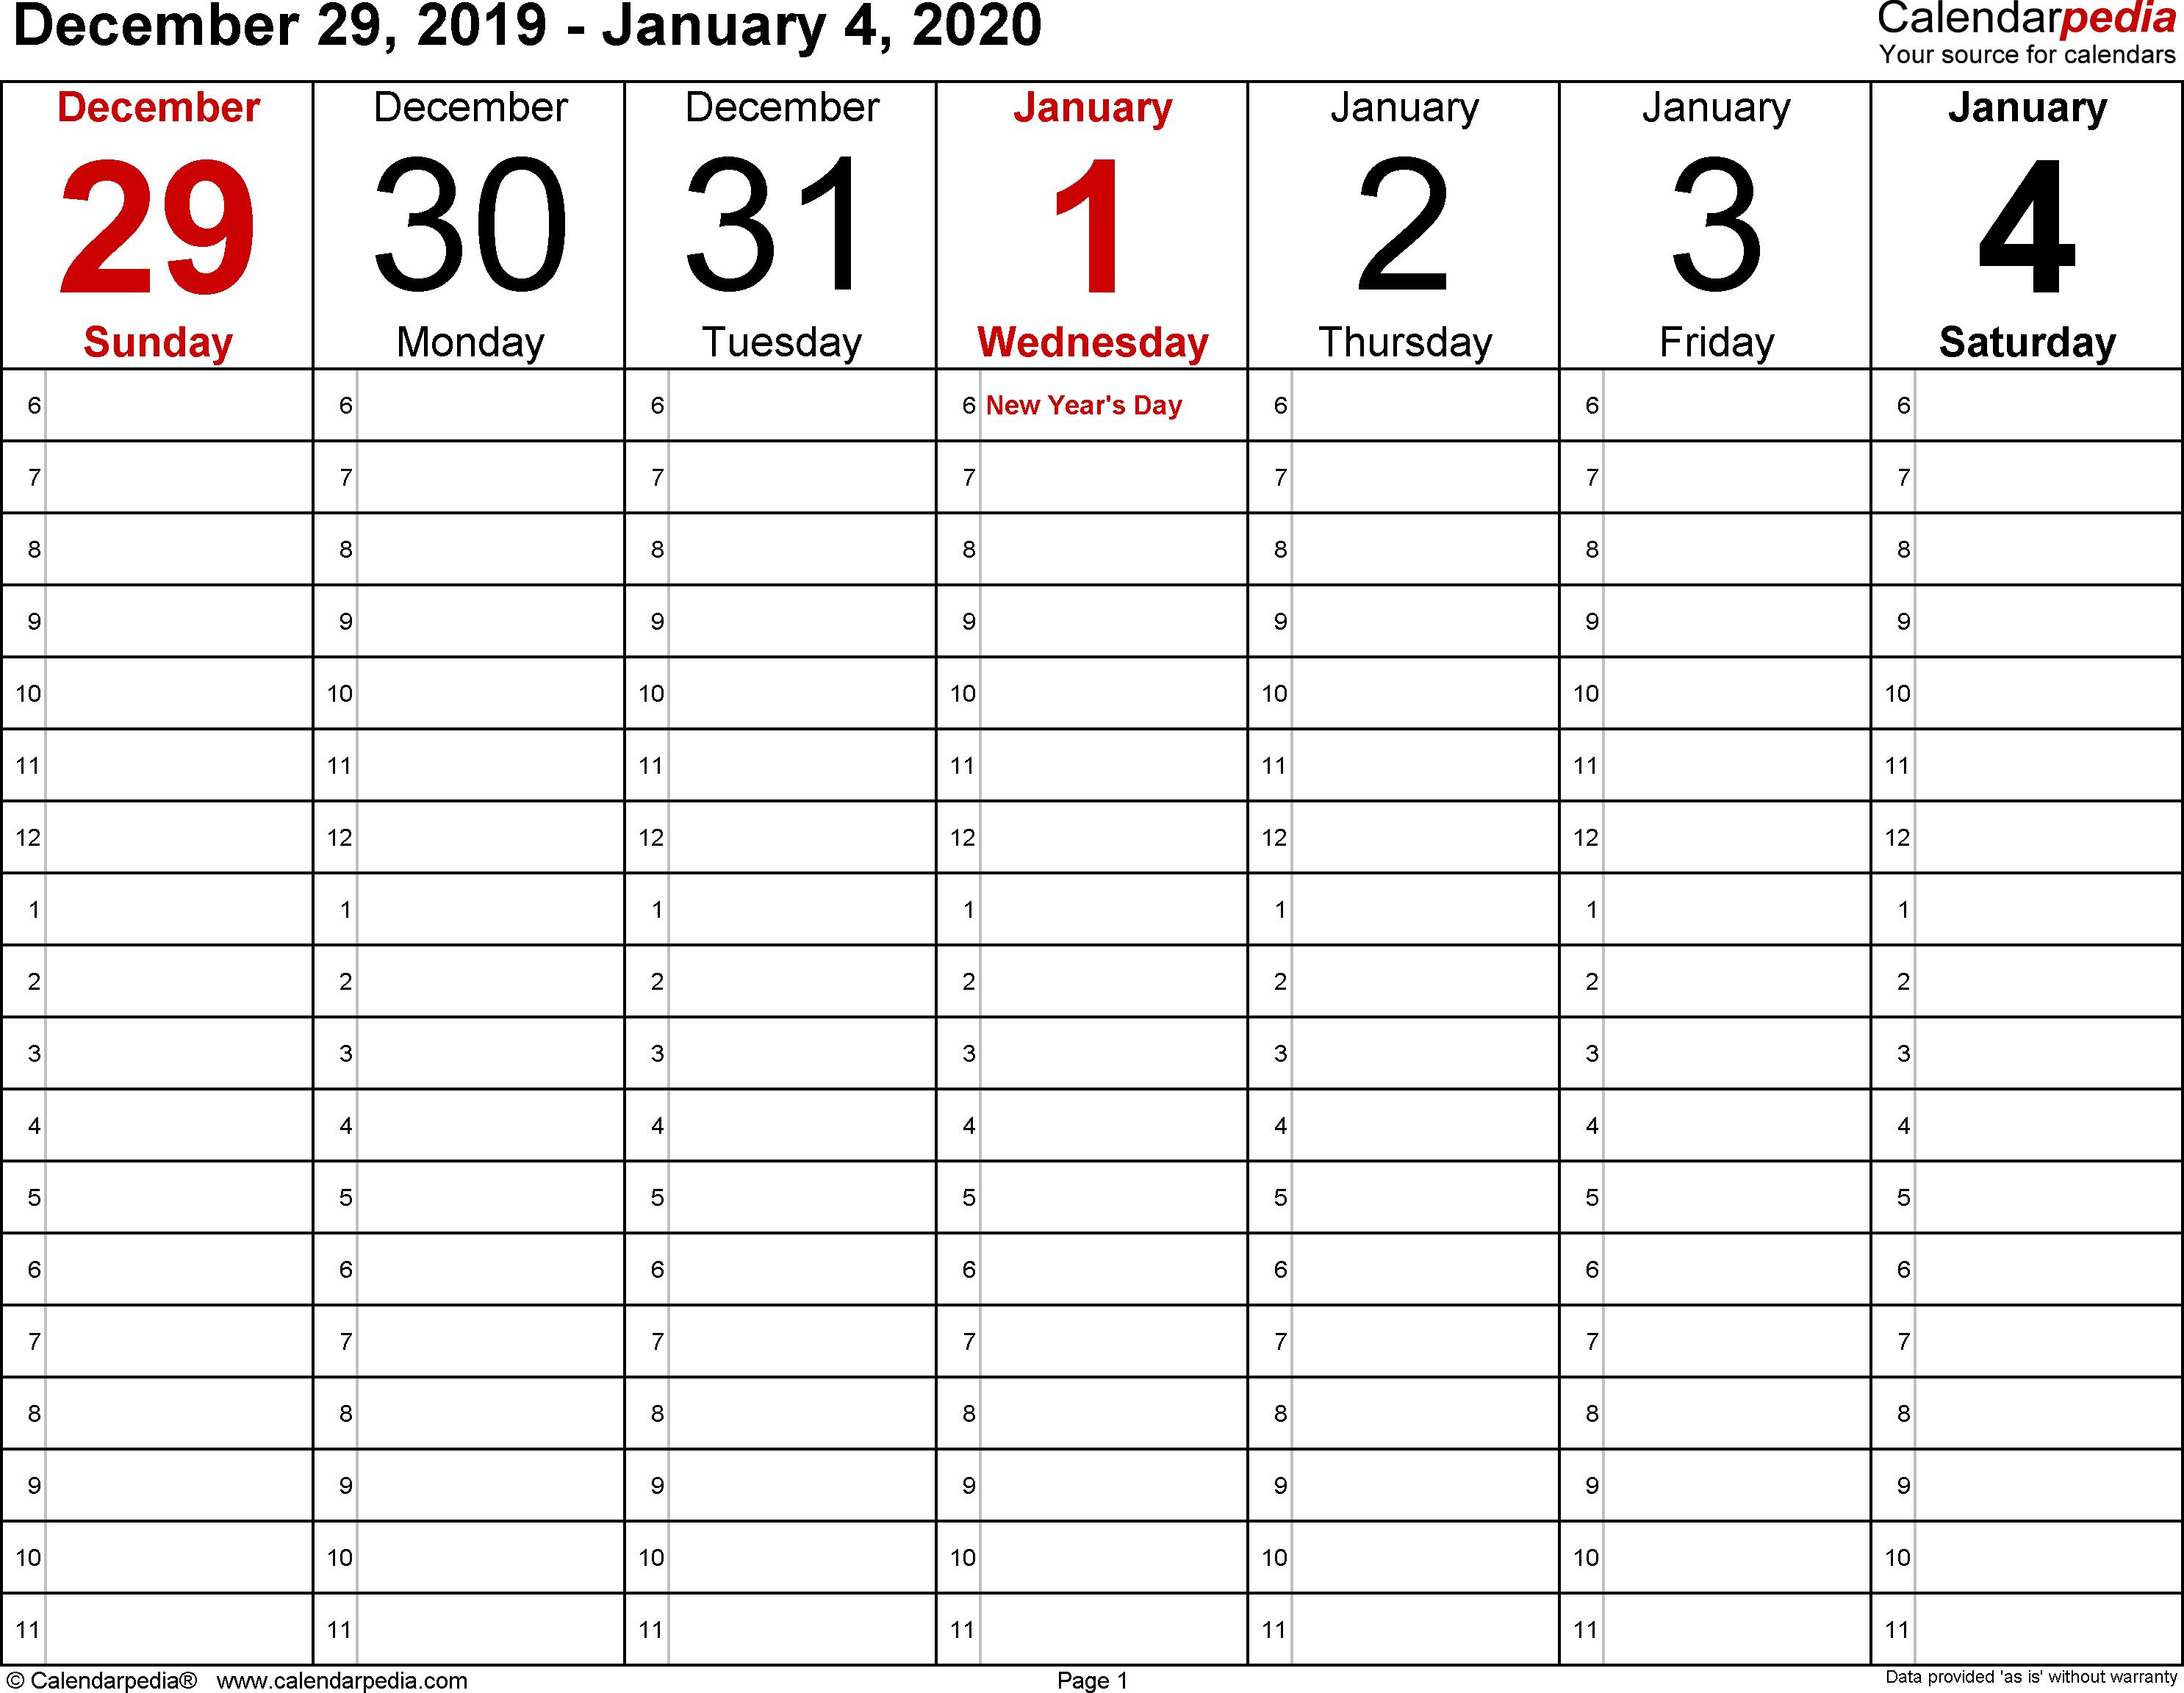 Weekly Calendar 2020 For Word - 12 Free Printable Templates inside 2020 Calendar 8.5 X 11